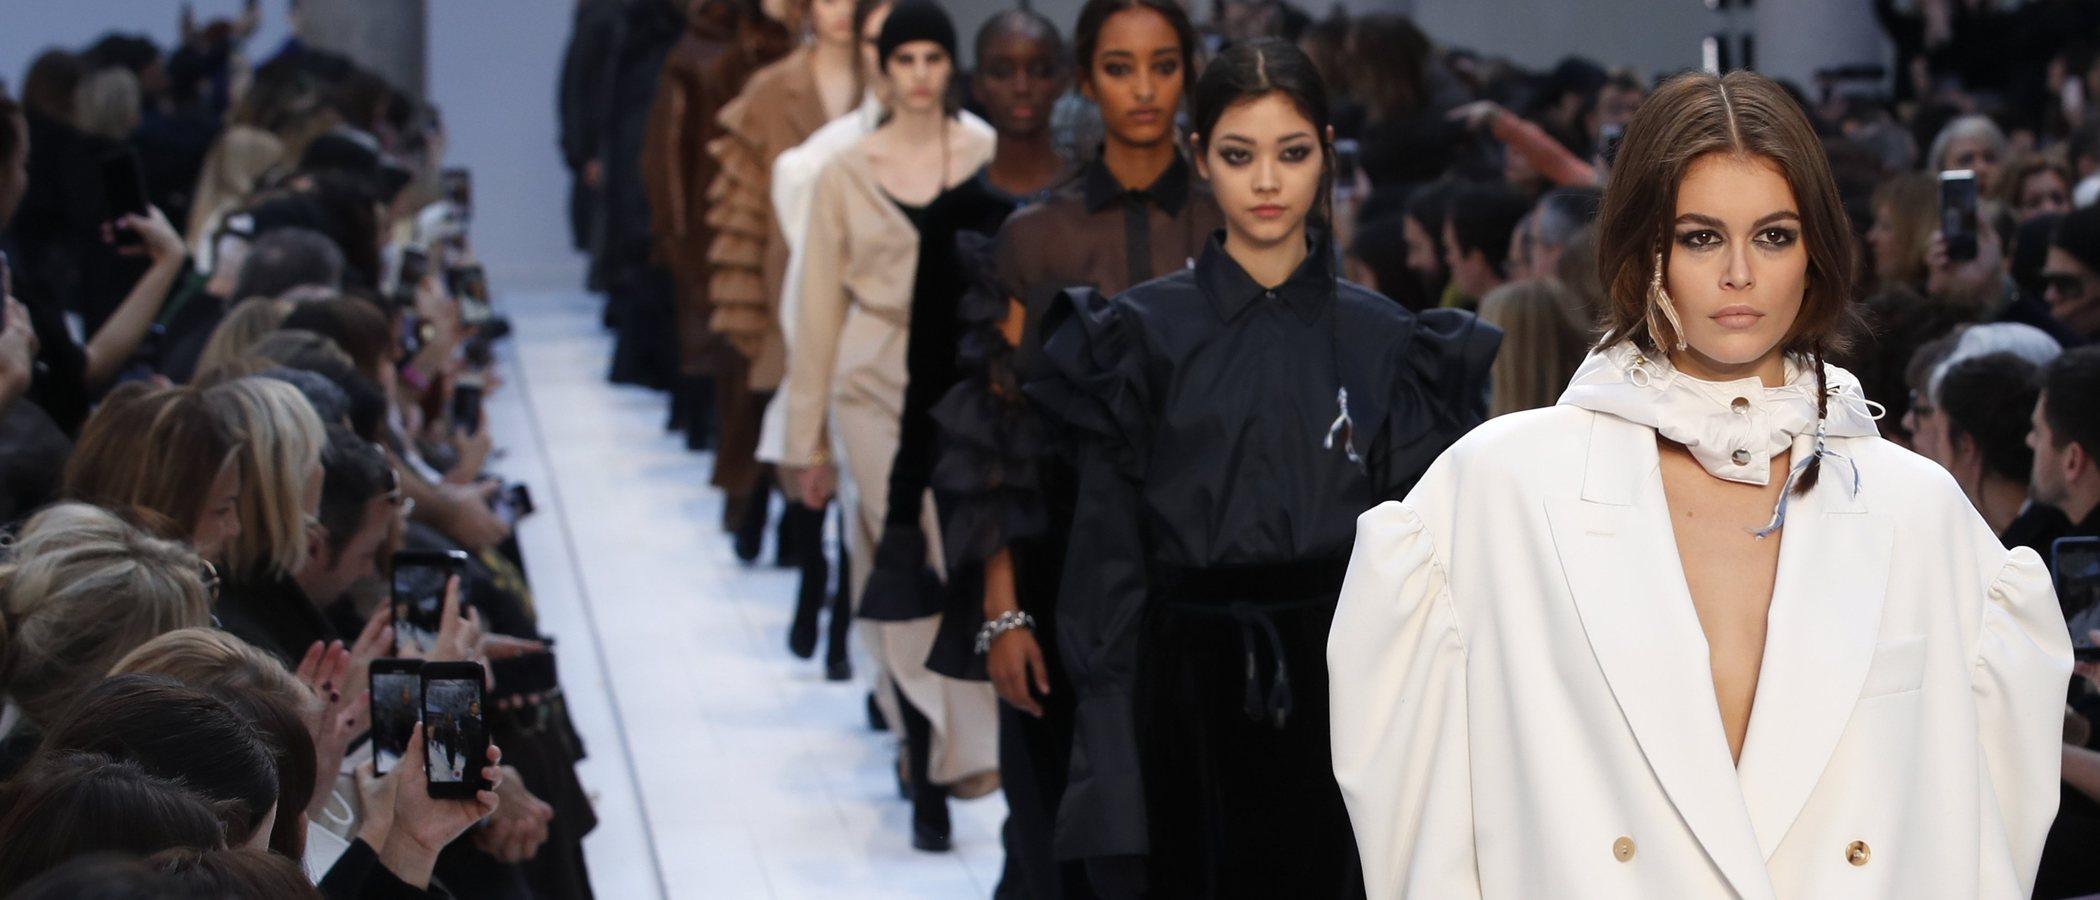 ¿Cuándo se celebran las Semanas de la Moda este 2021?